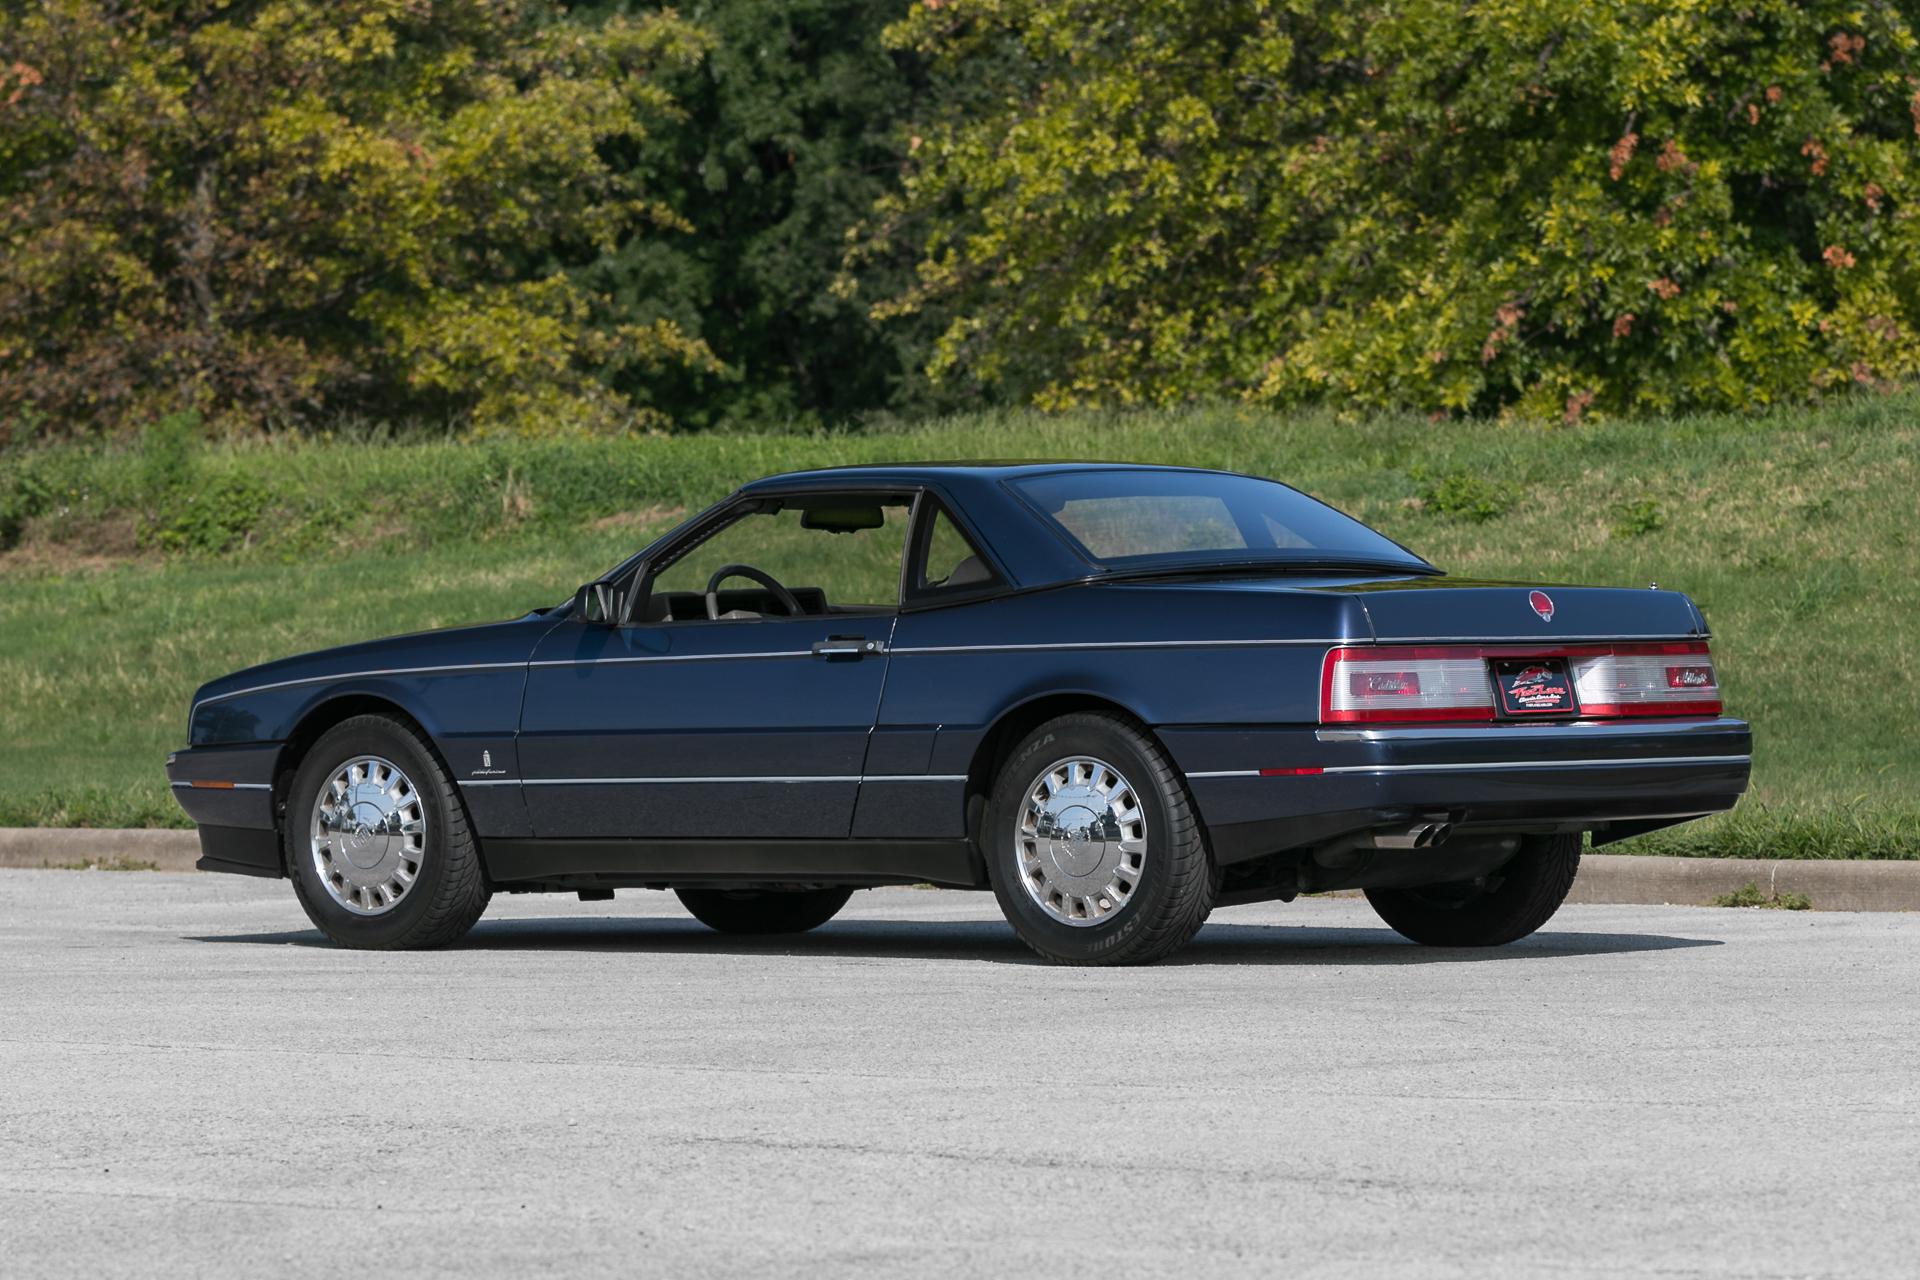 1993 cadillac allante fast lane classic cars. Black Bedroom Furniture Sets. Home Design Ideas